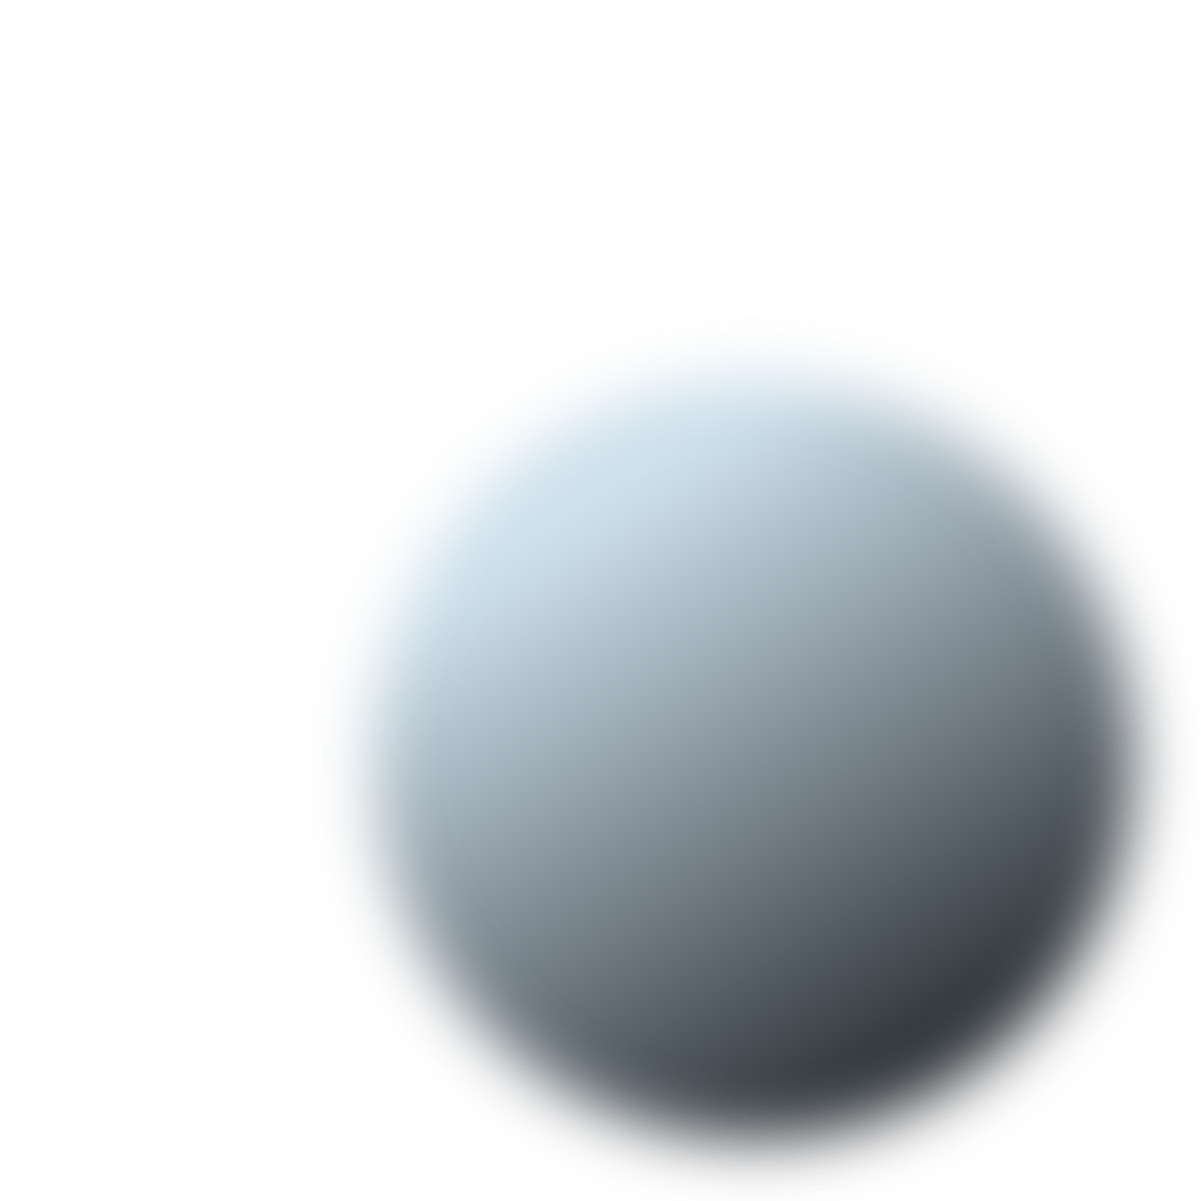 cover-left-bg-1-3-compressed